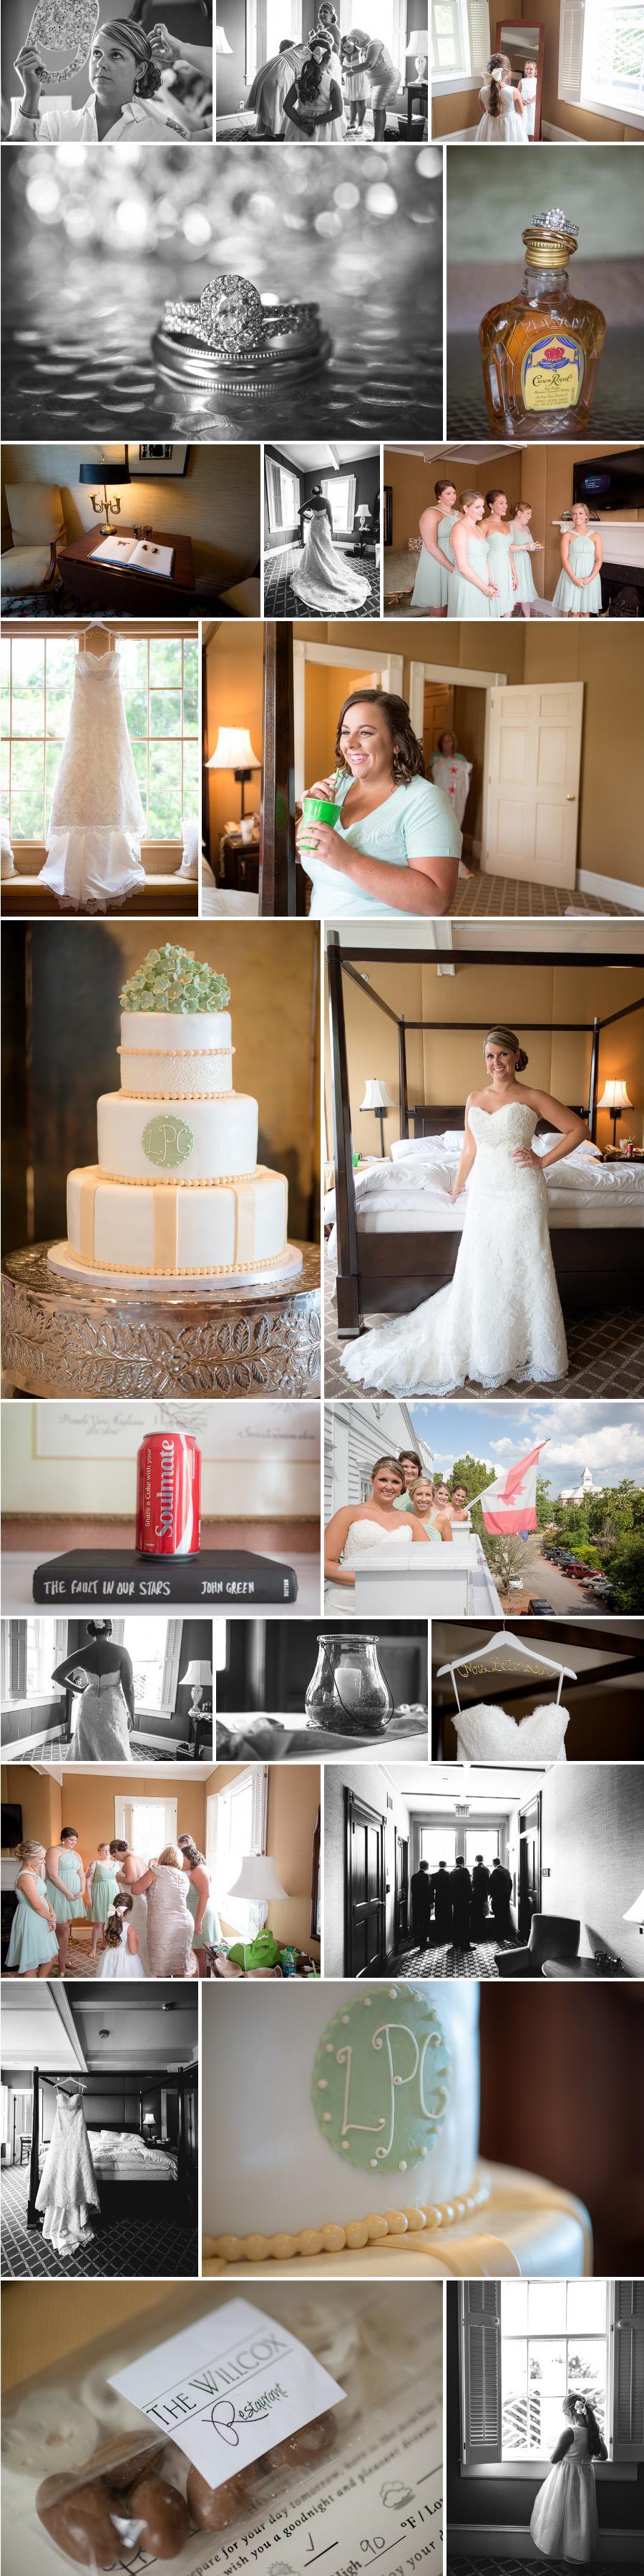 wilcox-wedding-images-1